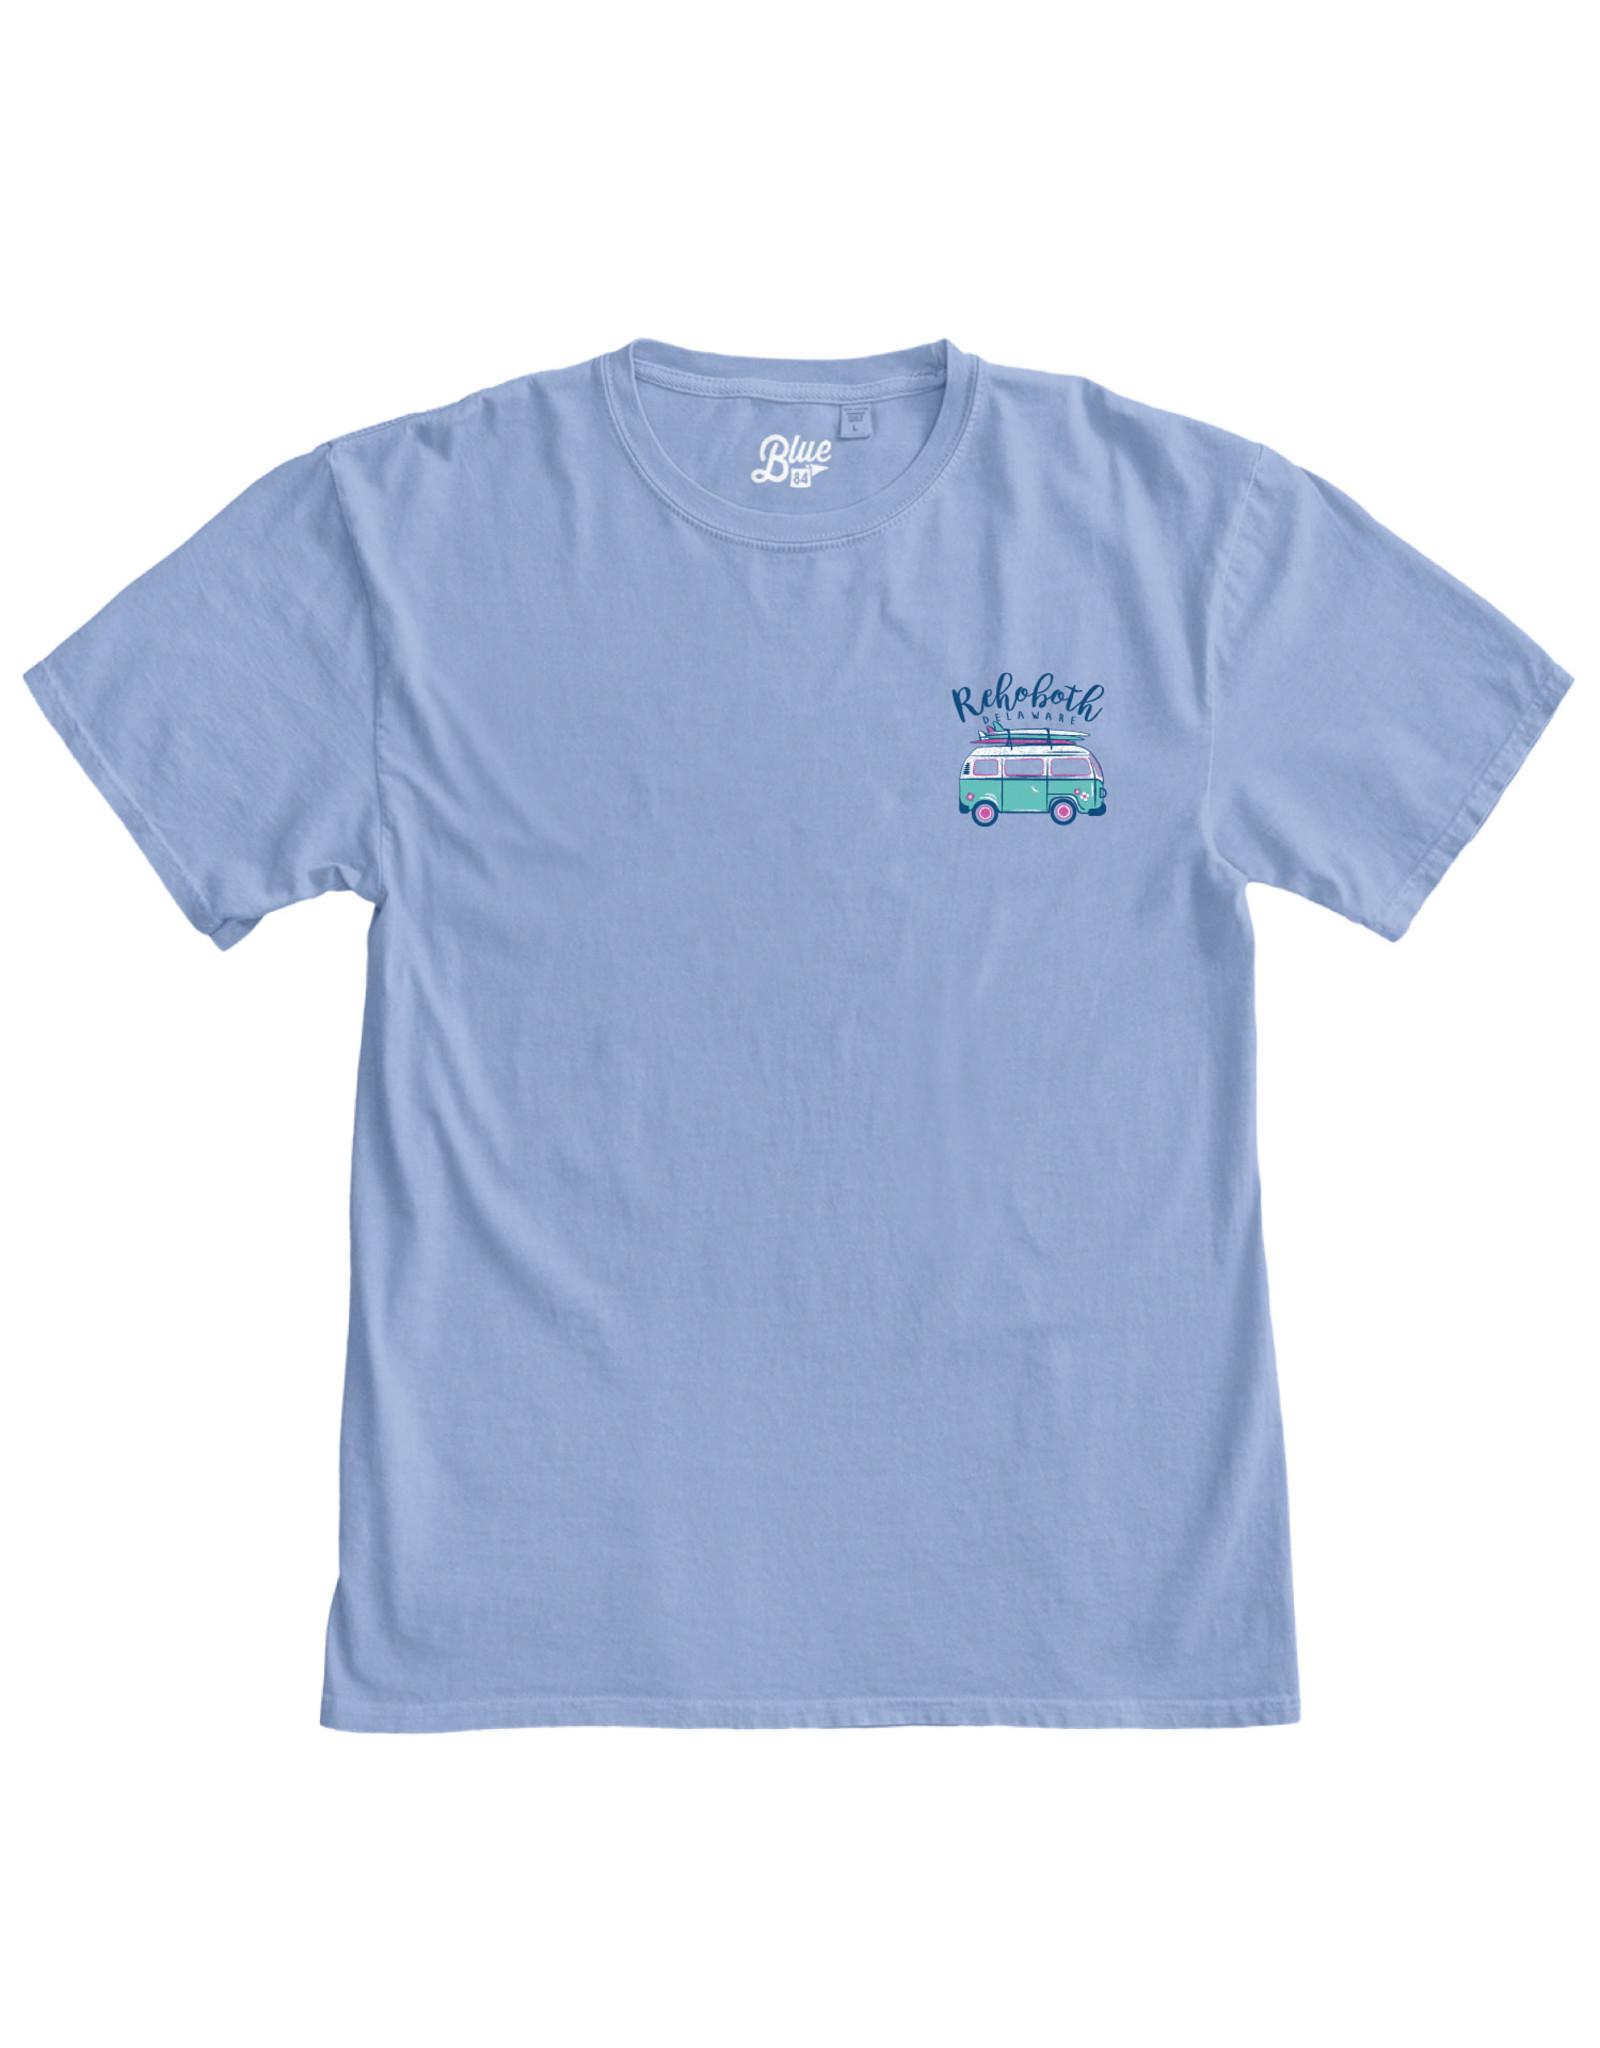 BLUE 84 AMERIGO SURF VAN SS TEE